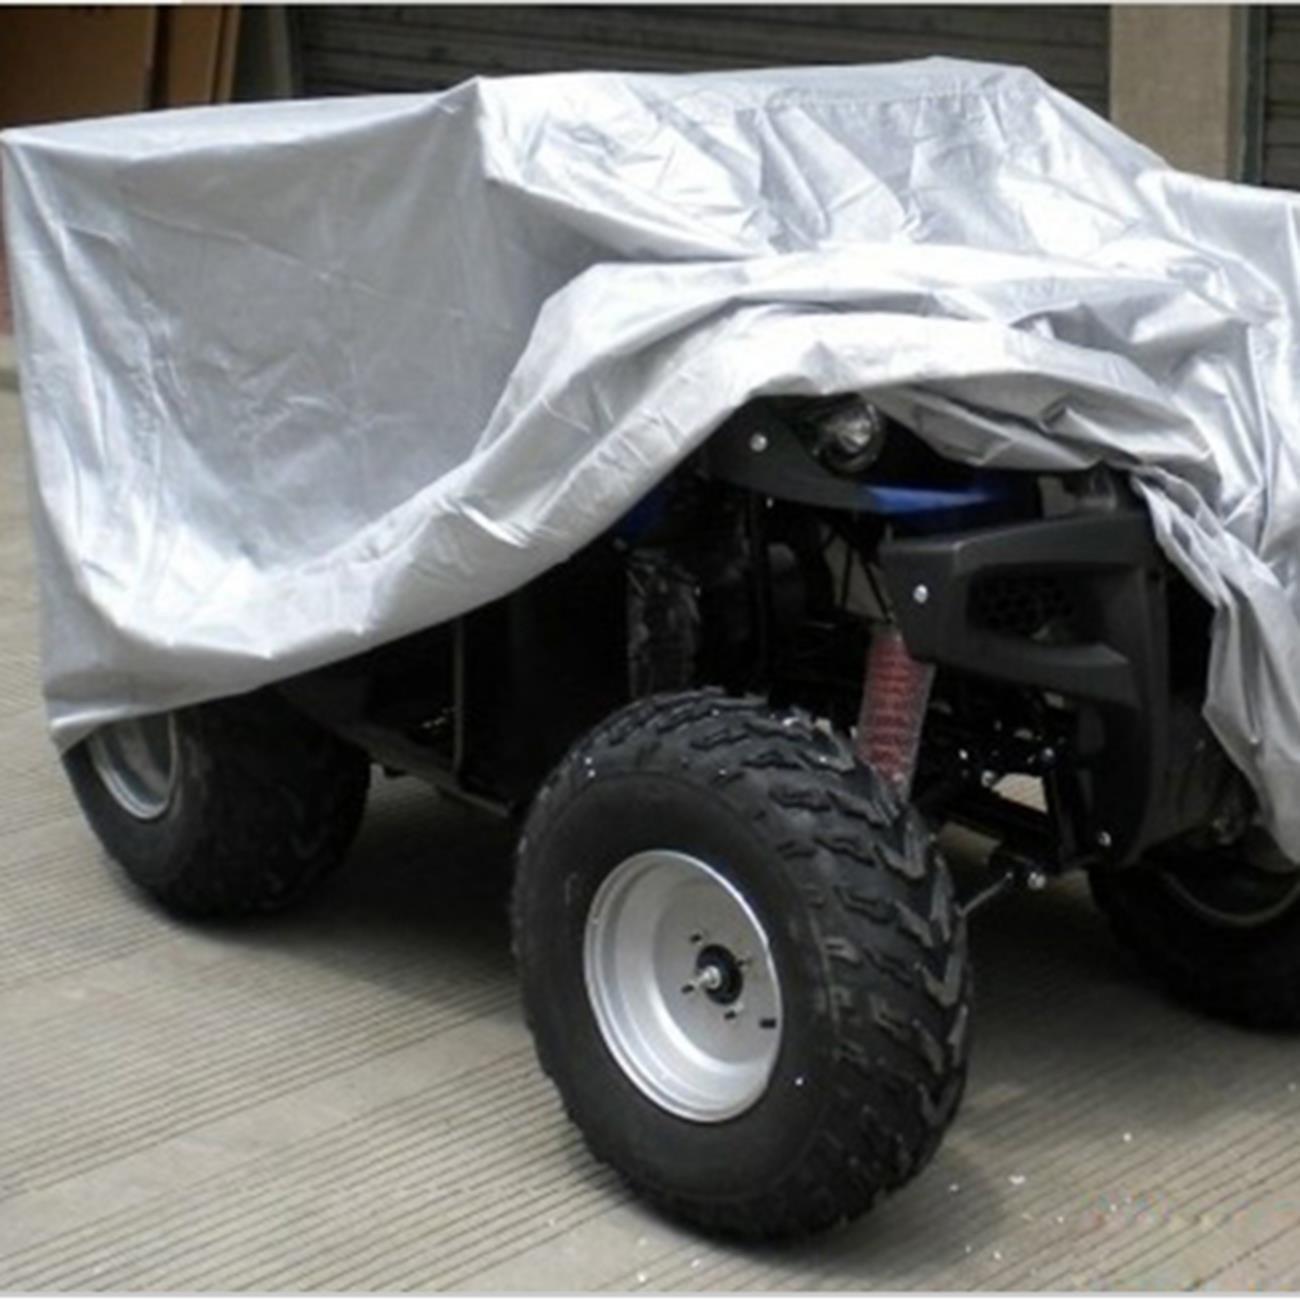 INNOGLOW 210T XL 210x120x115CM 82 Universal Black UTV ATV Storage Cover All Season Durable Waterproof Wind-proof UV Protection for POLARIS SUZUKI YAMAHA KAWASAKI HONDA RANCHER FOREMAN FOURTRAX RECON